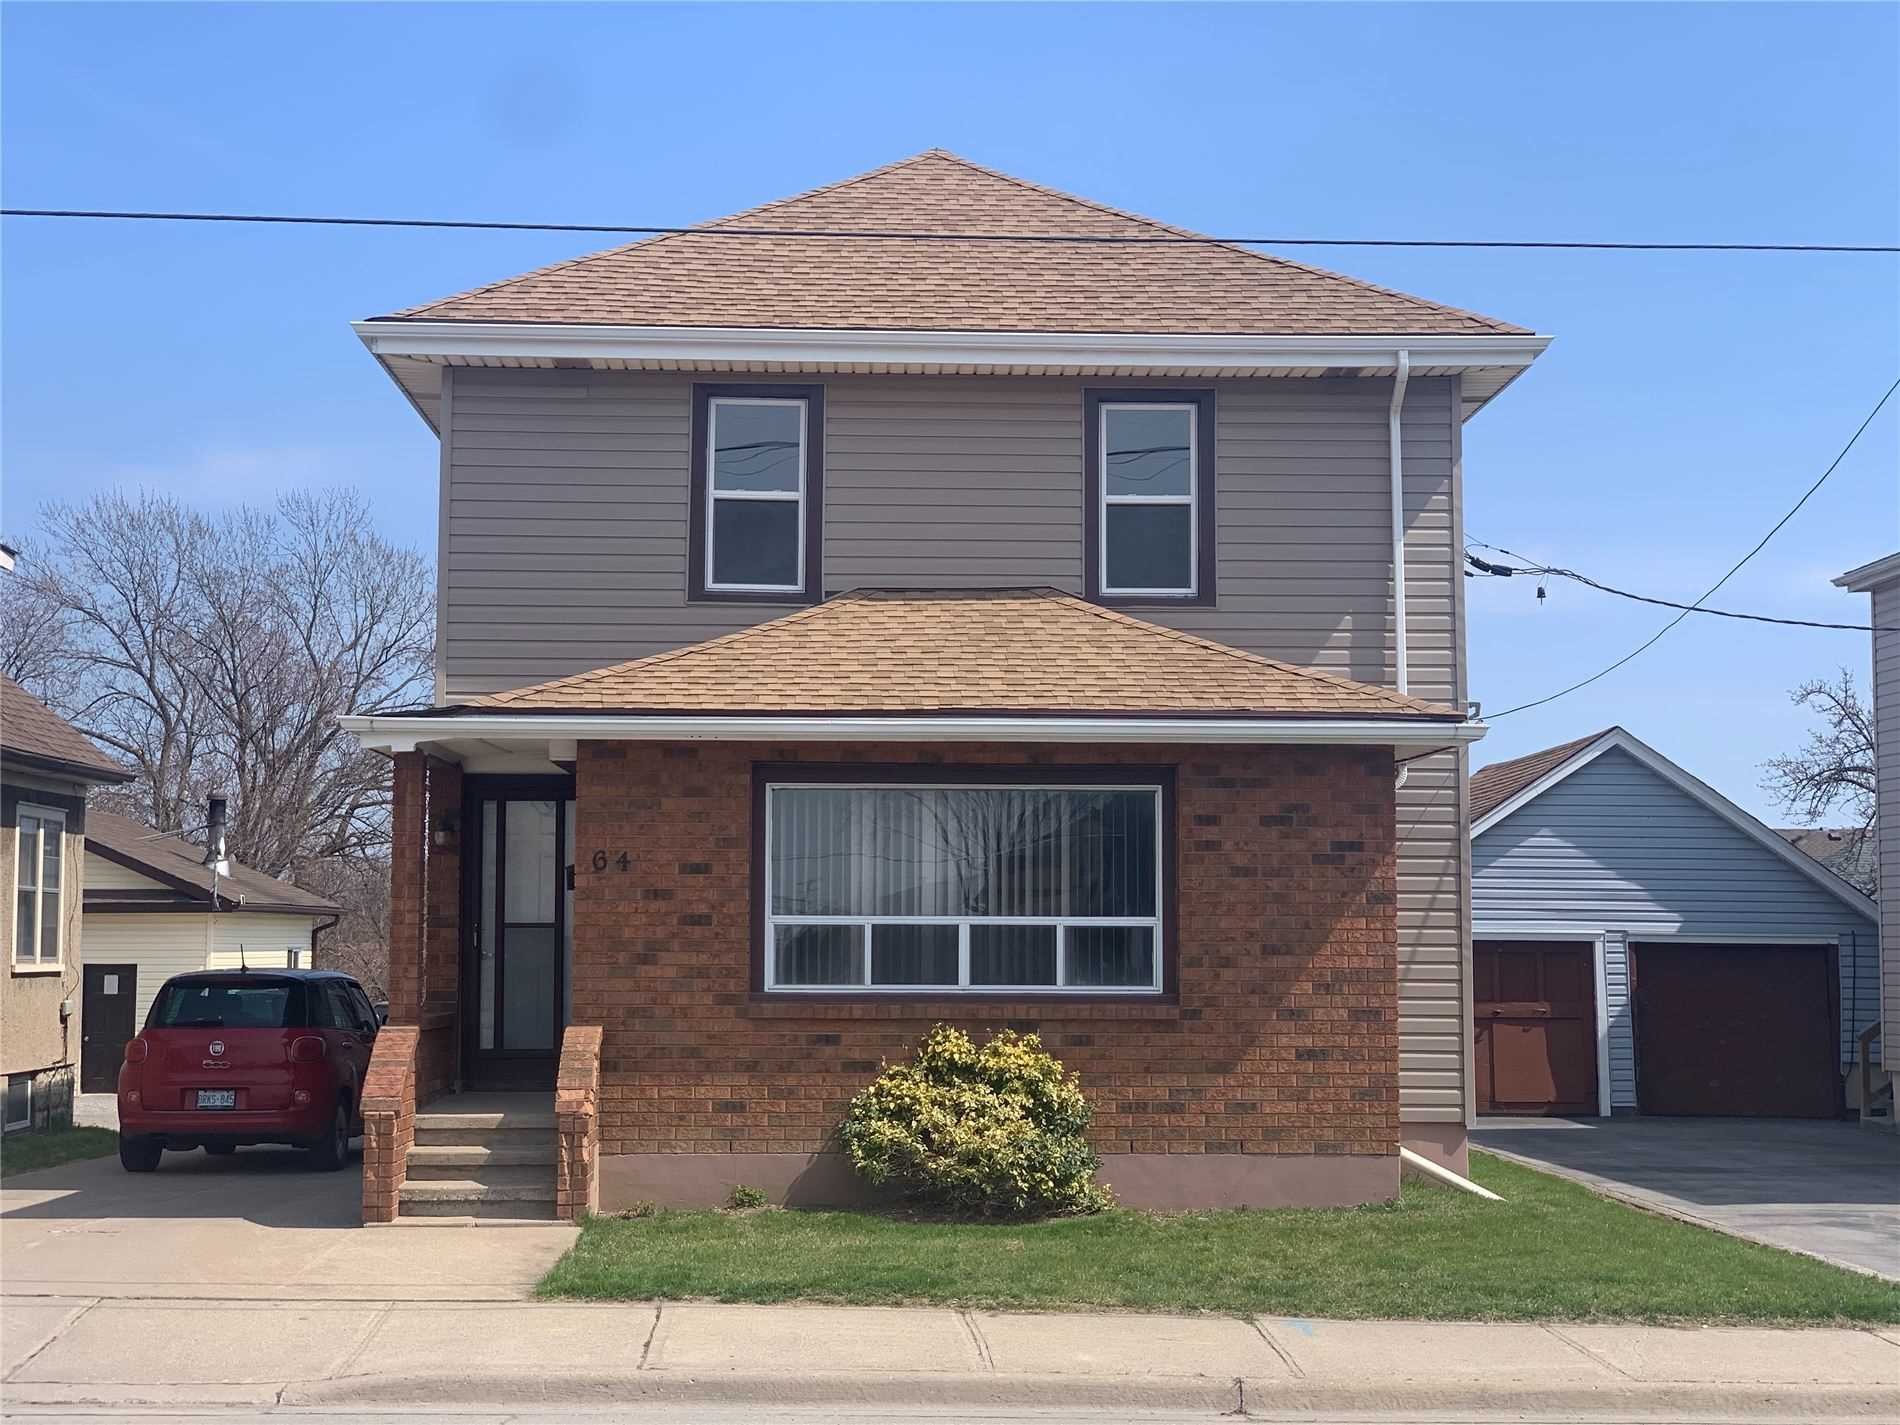 64 Pine St, Thorold, Ontario L2V 3L4, 5 Bedrooms Bedrooms, ,4 BathroomsBathrooms,Fourplex,For Sale,Pine,X5183251